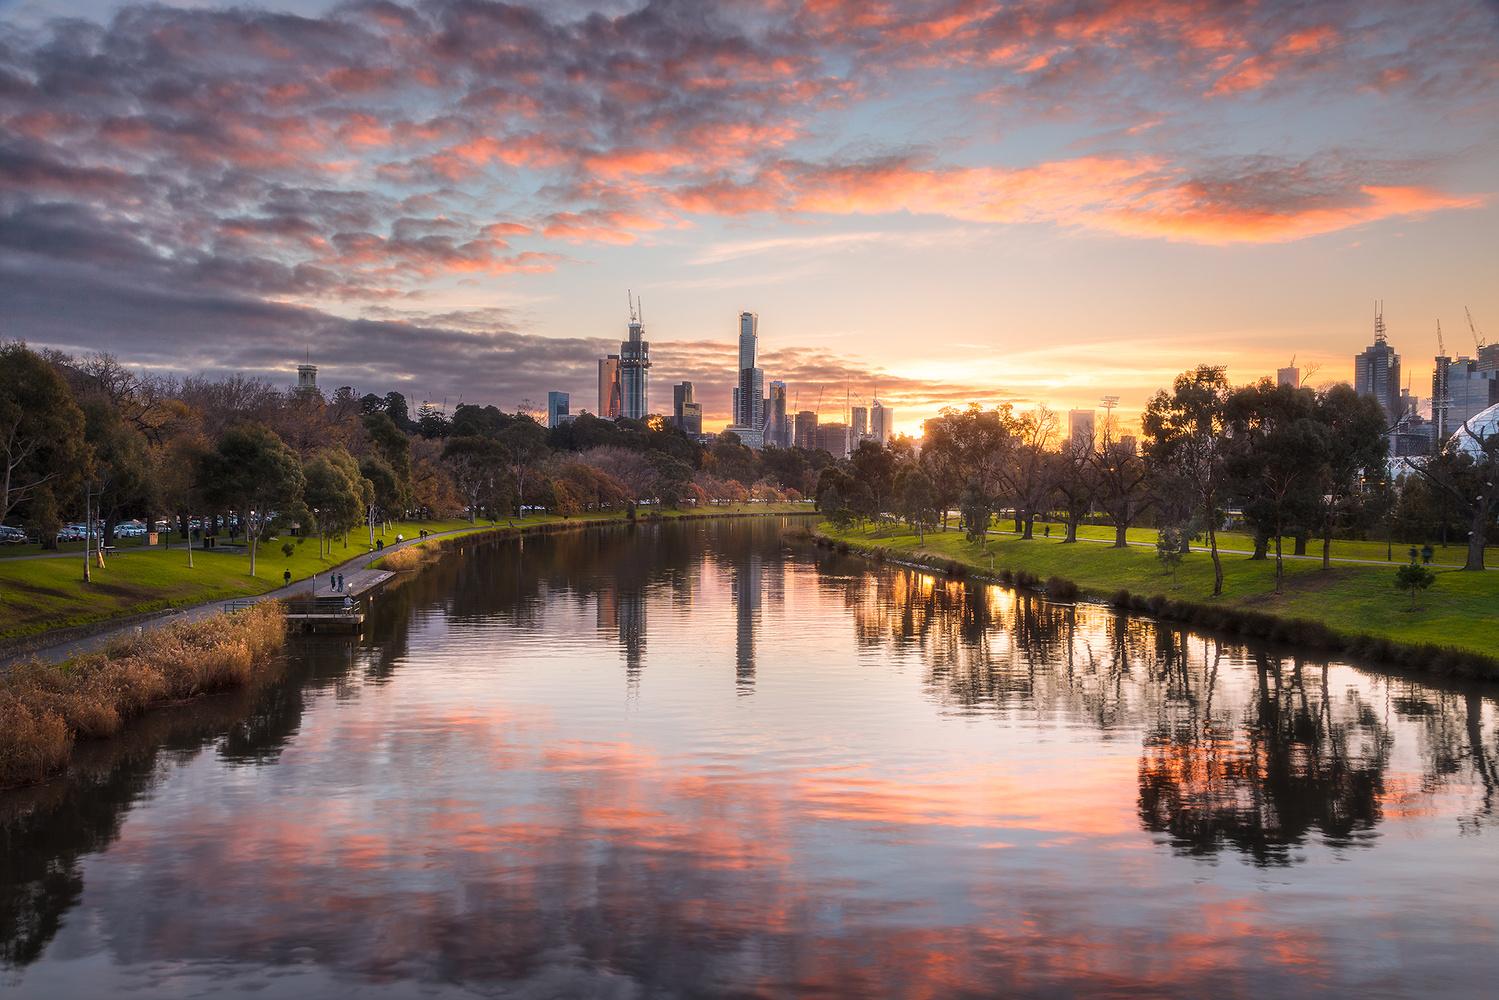 Yarra River Sunset by Kieran Stone